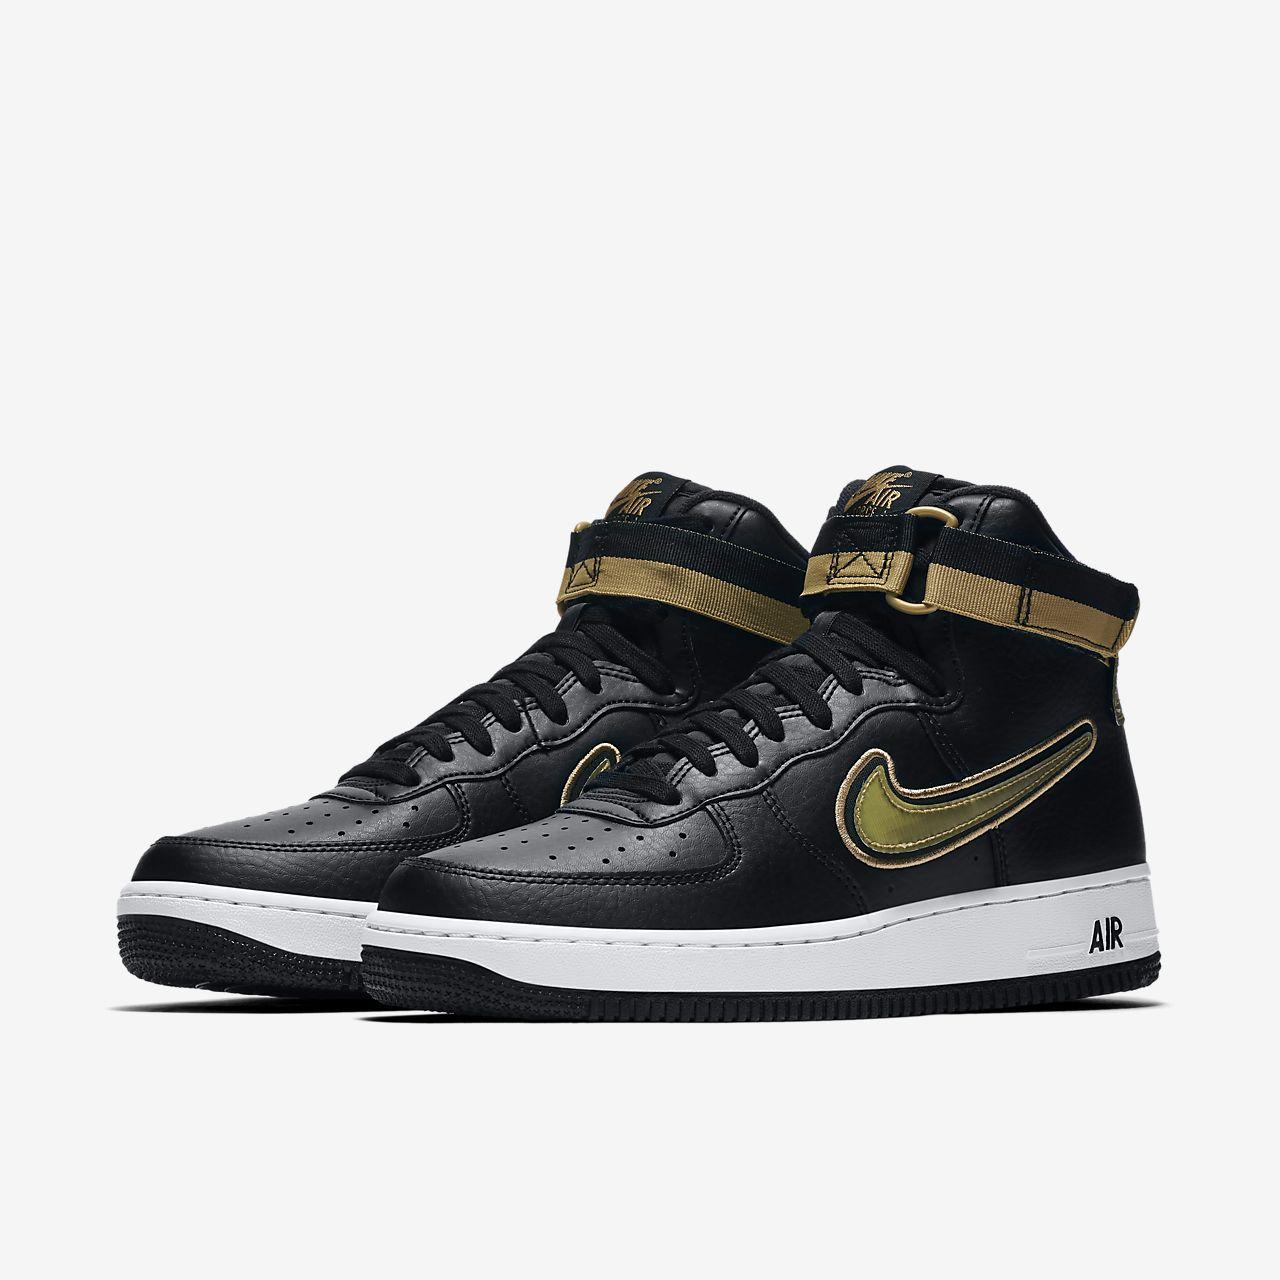 official photos af02c 74a22 ... Scarpa Nike Air Force 1 High  07 LV8 Sport NBA - Uomo